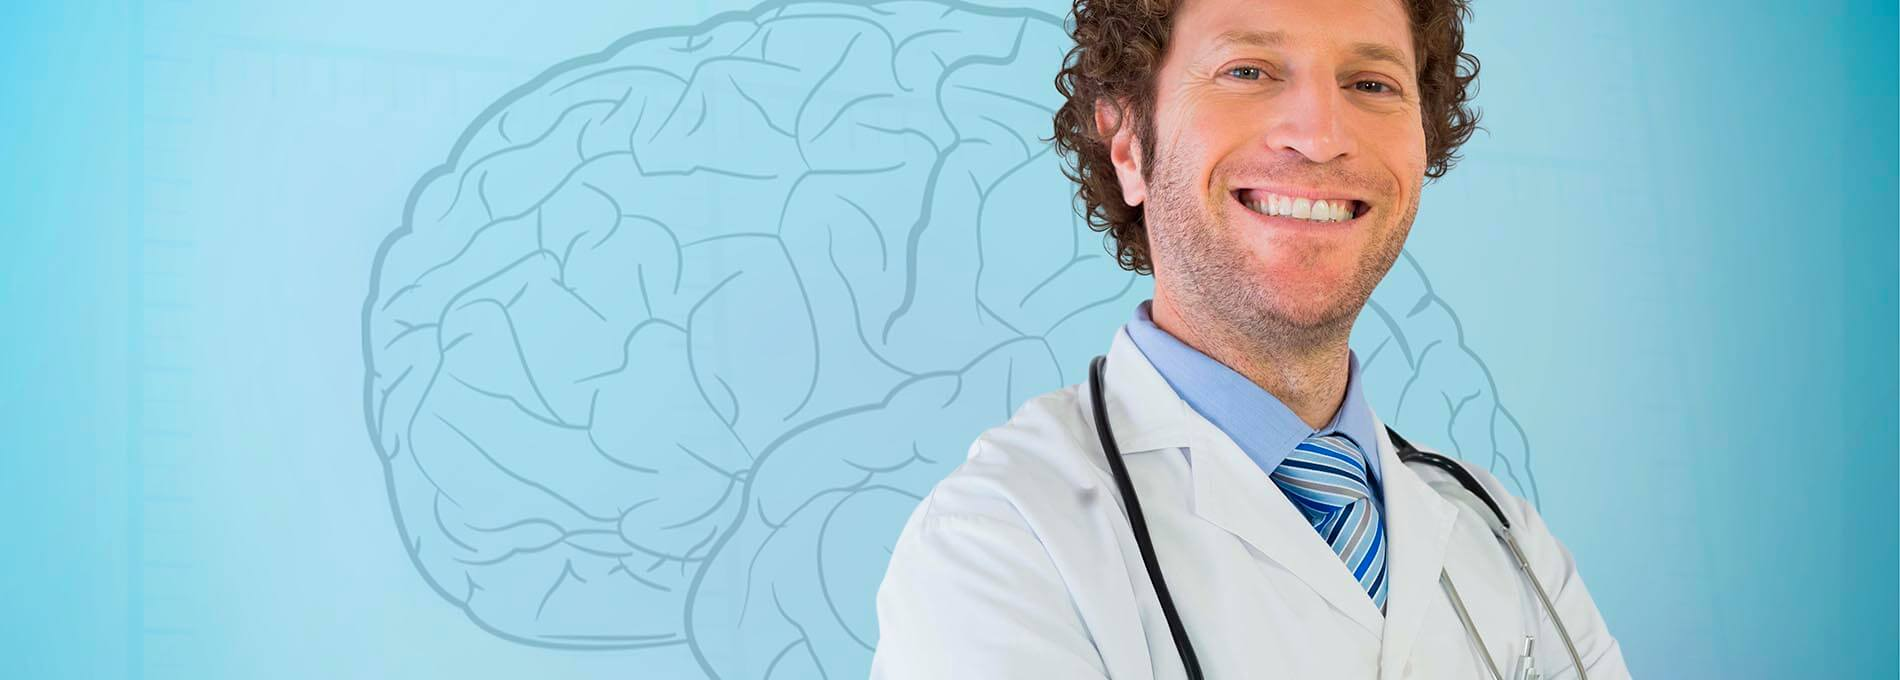 Línea Neurológica